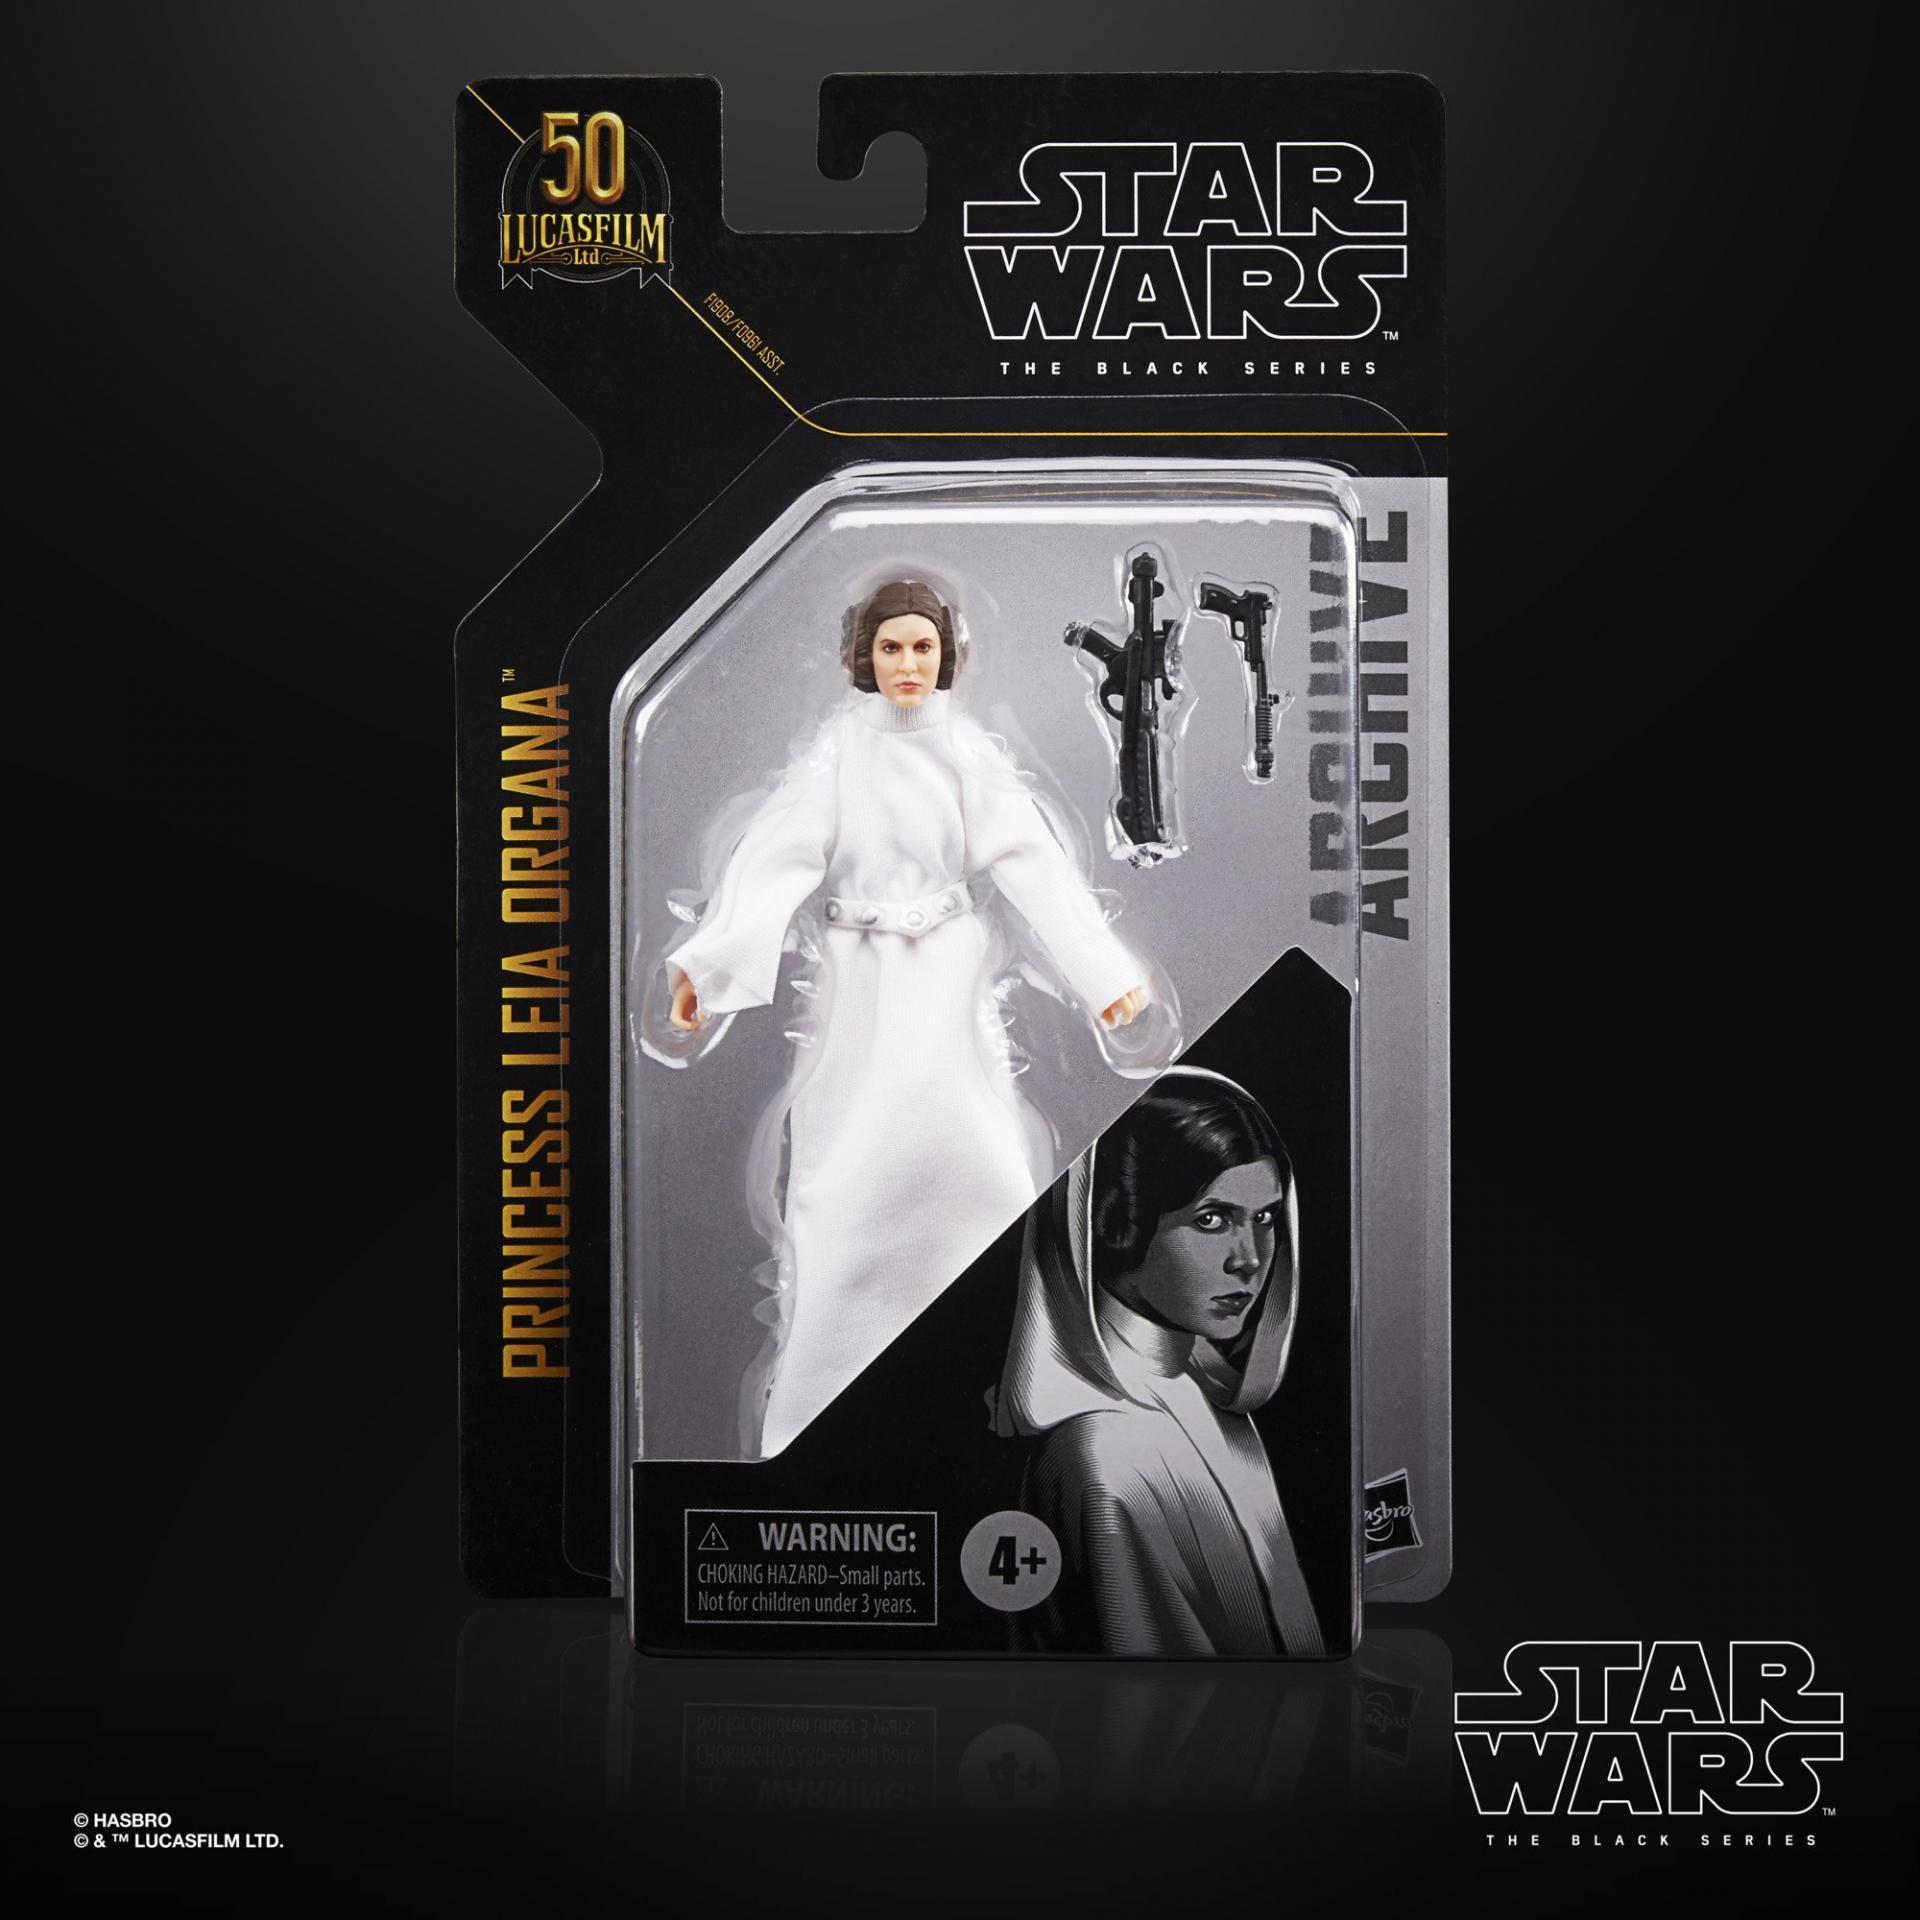 Star wars the black series archive princess leia organa 15cm